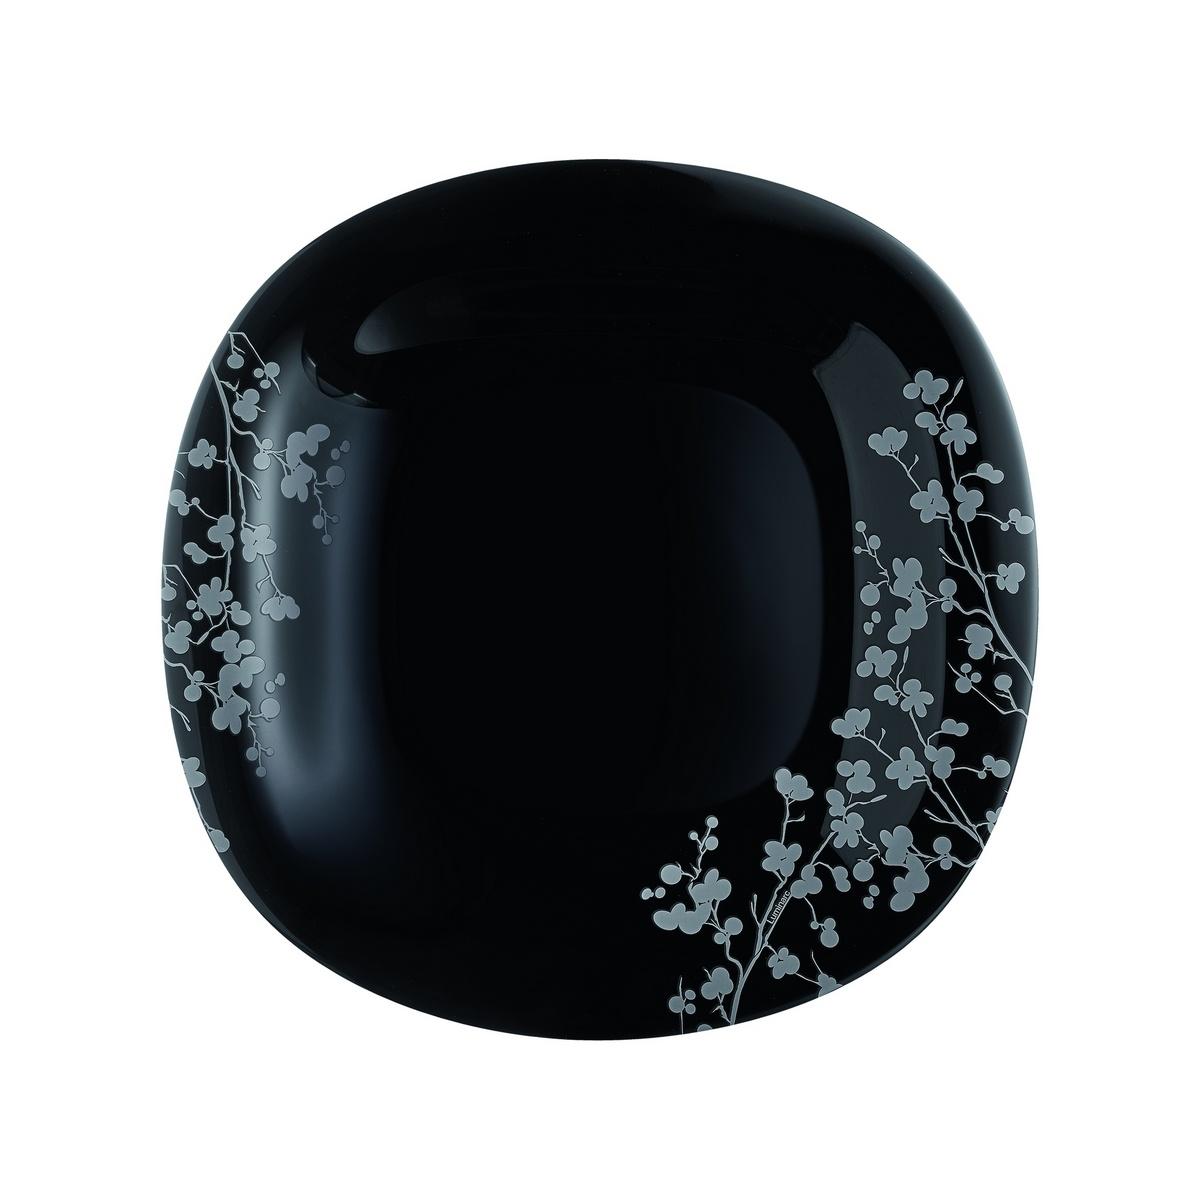 Luminarc Sada dezertních talířů Ombrelle 19 cm, 6 ks, černá